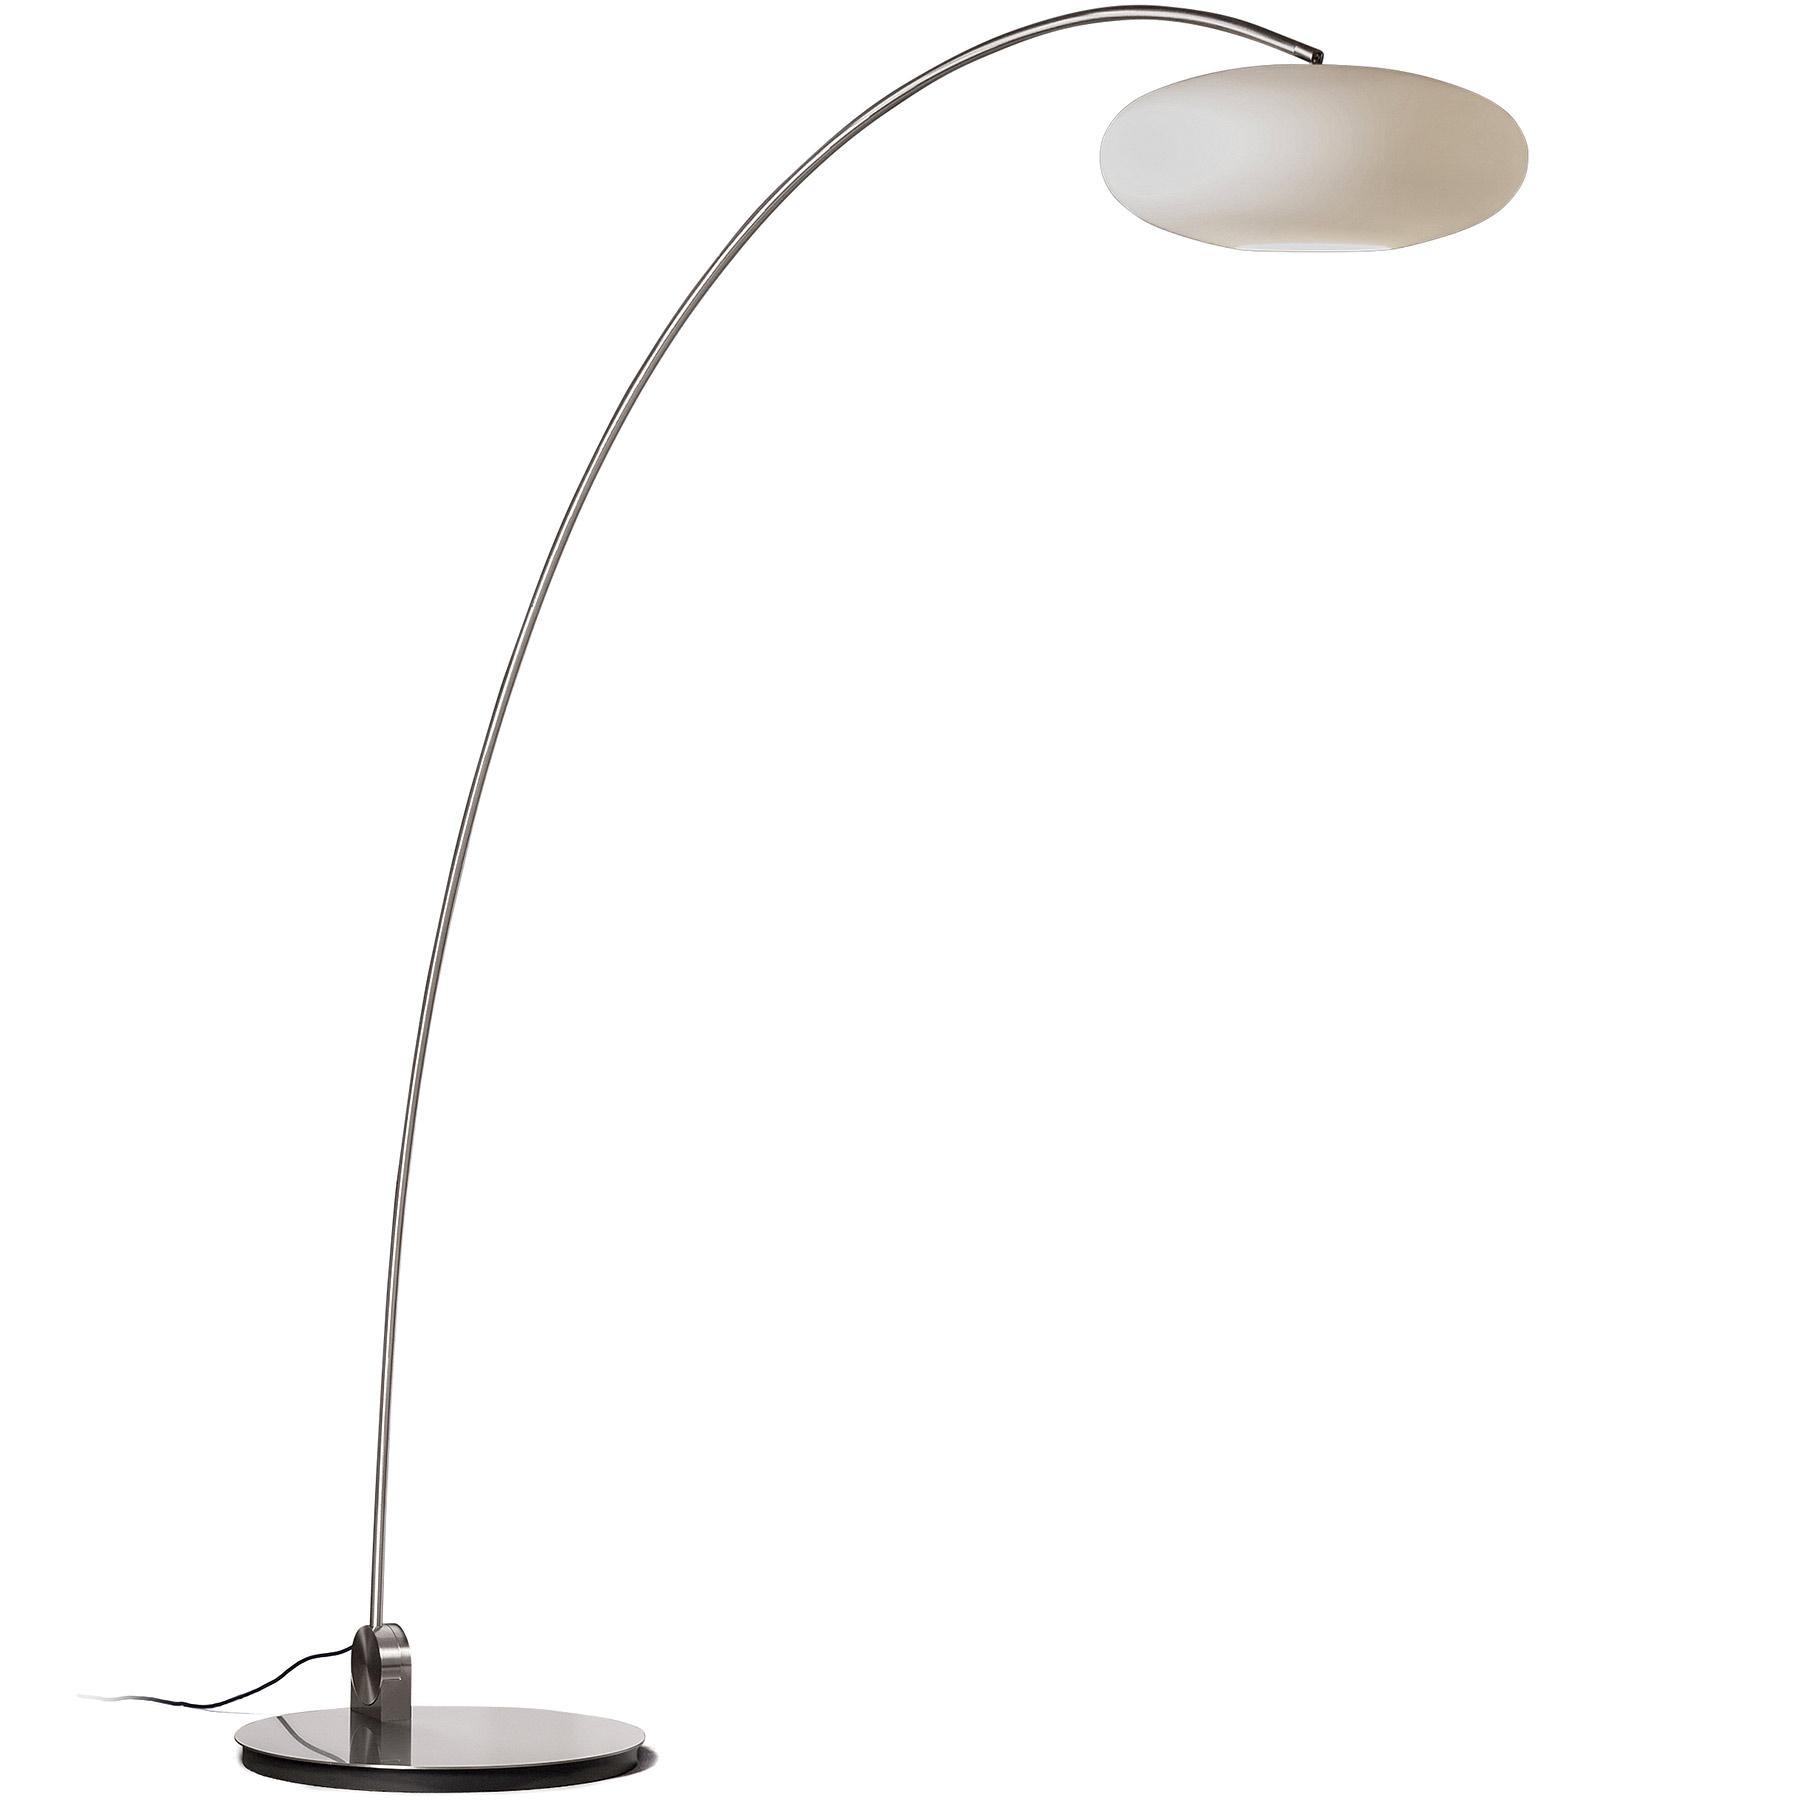 Adjustable Arc Light Amor B With Glass Shade Casa Lumi